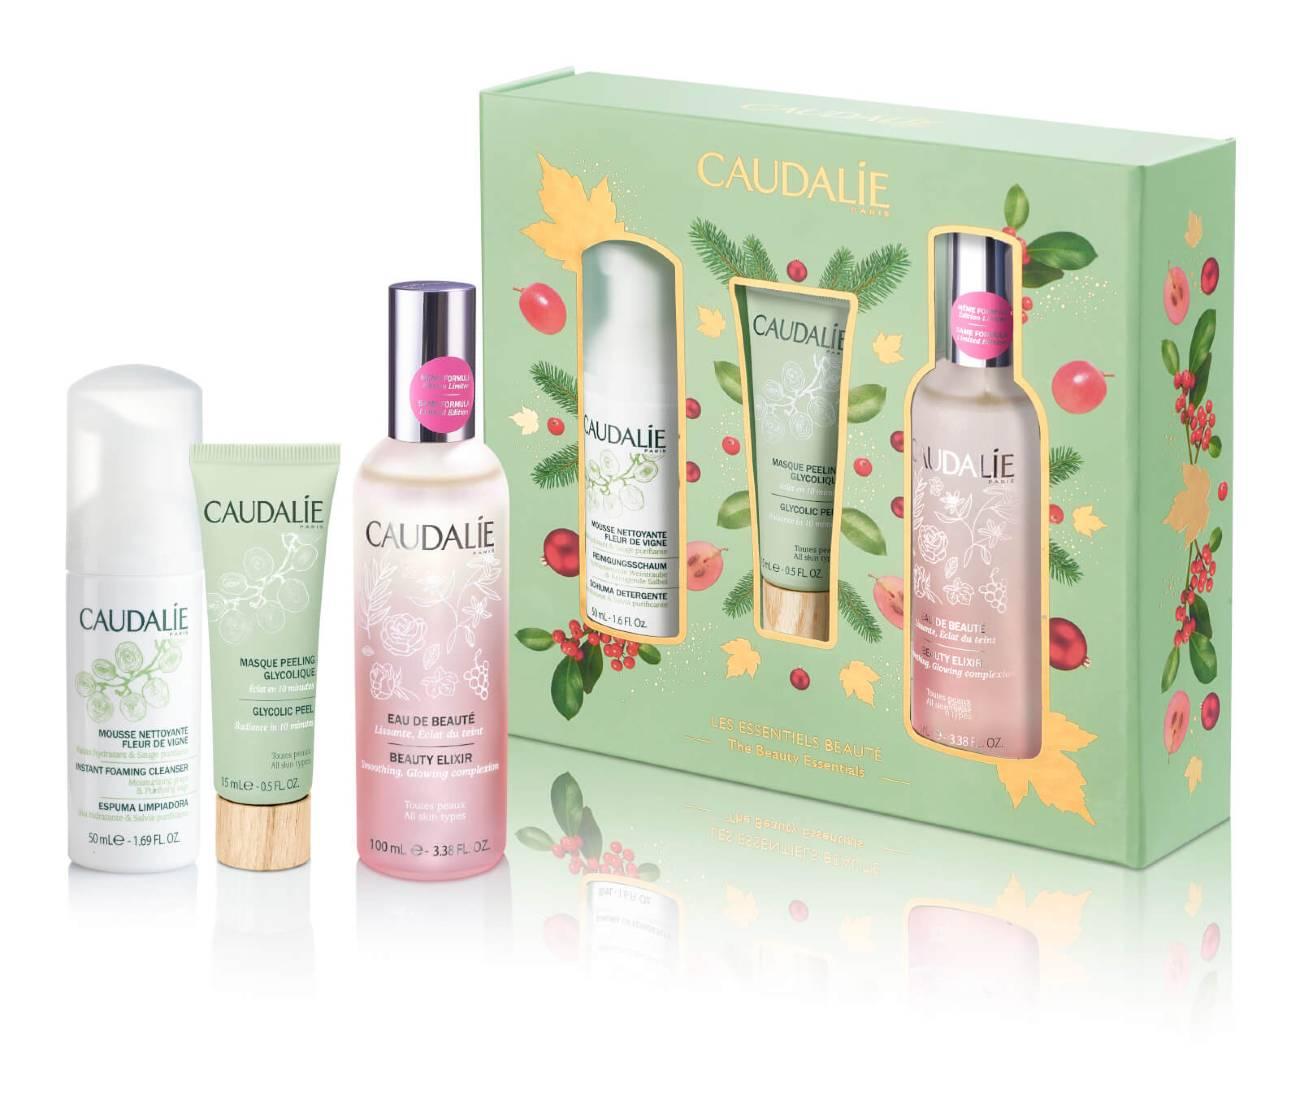 Caudalie Beauty Elixir Christmas Set The Beauty Essentials